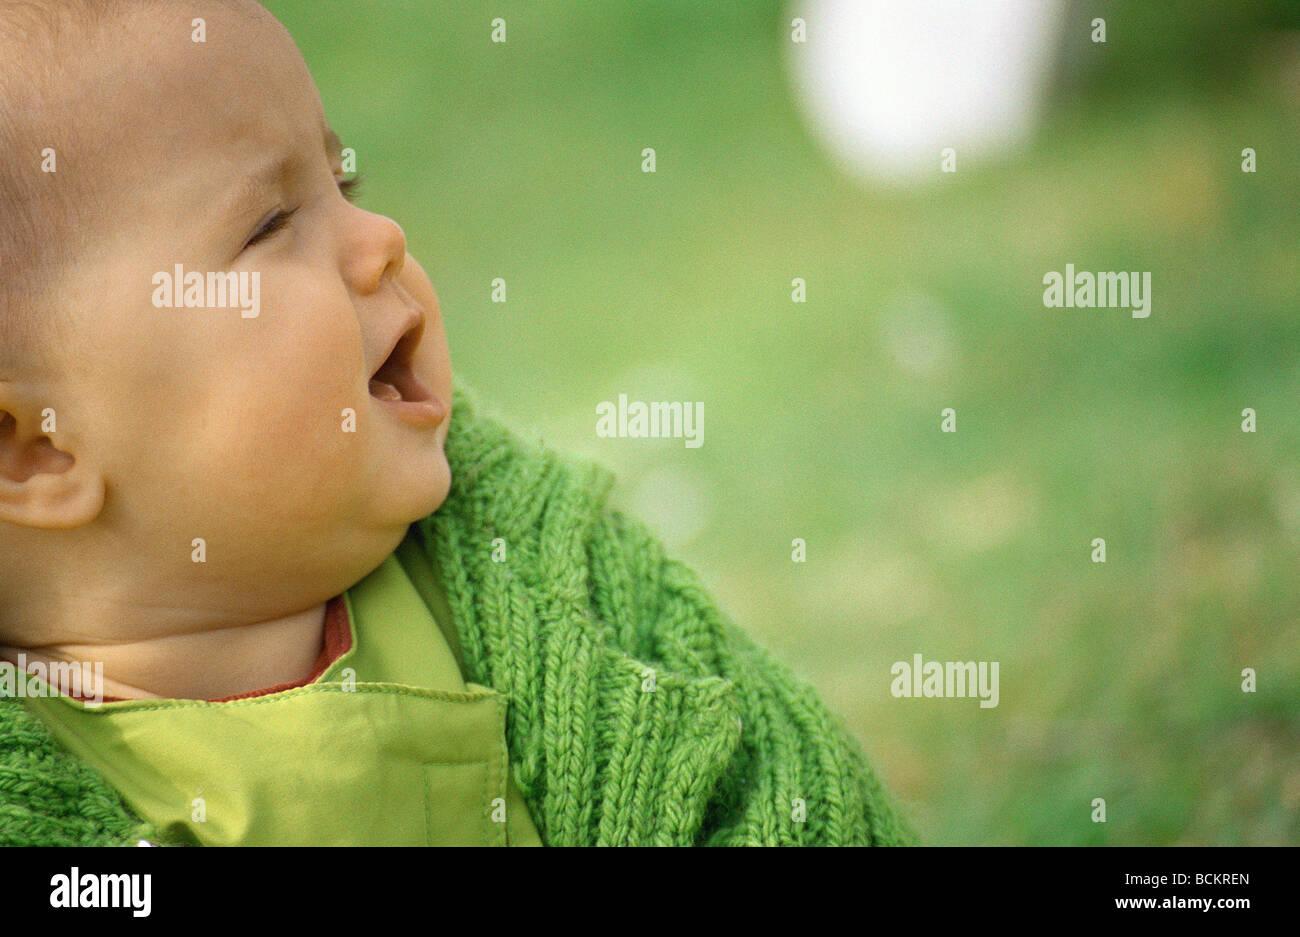 Baby crying - Stock Image